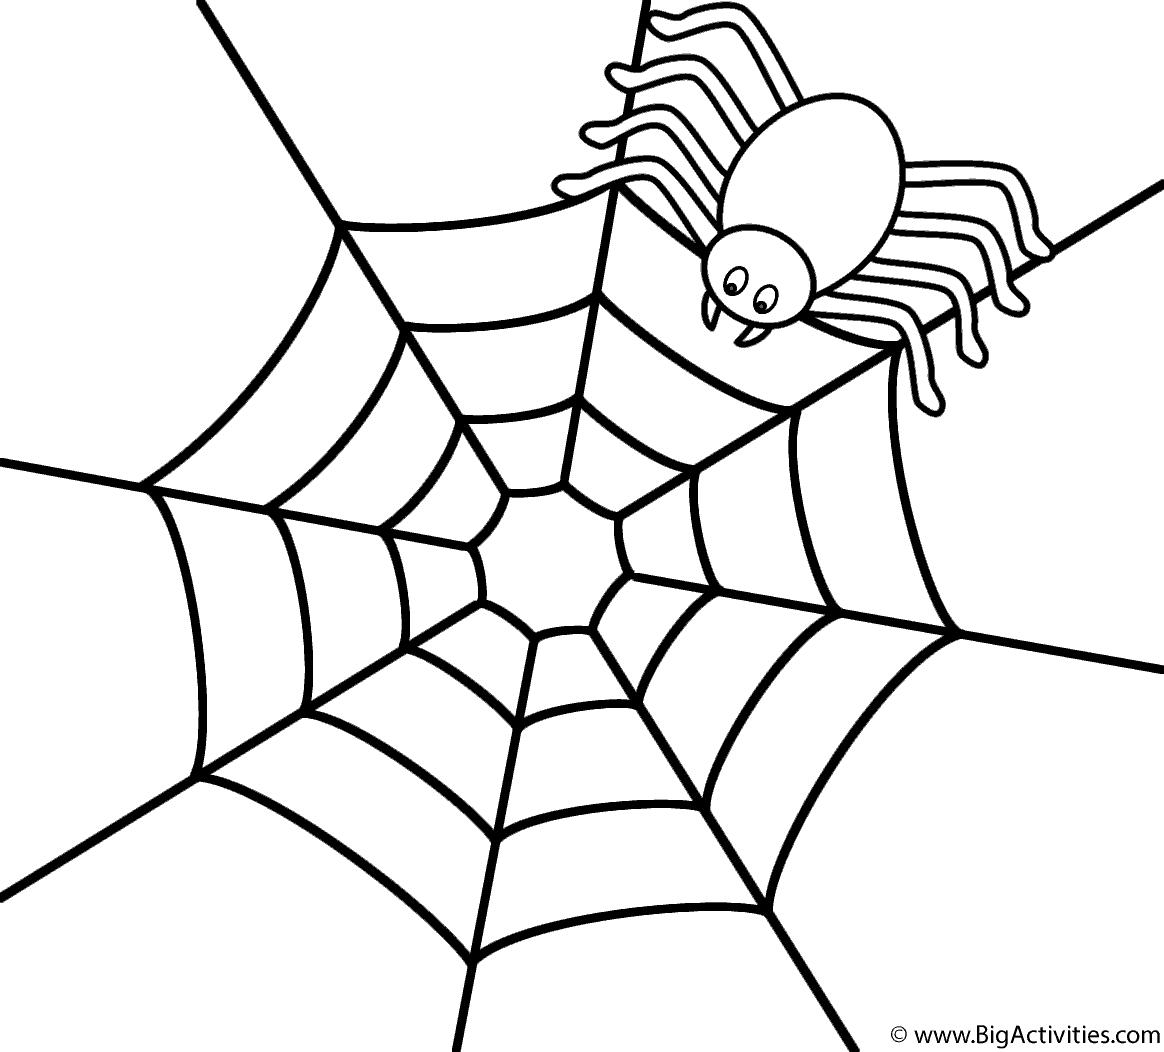 printable coloring pages websites free printable spider web coloring pages for kids pages coloring printable websites